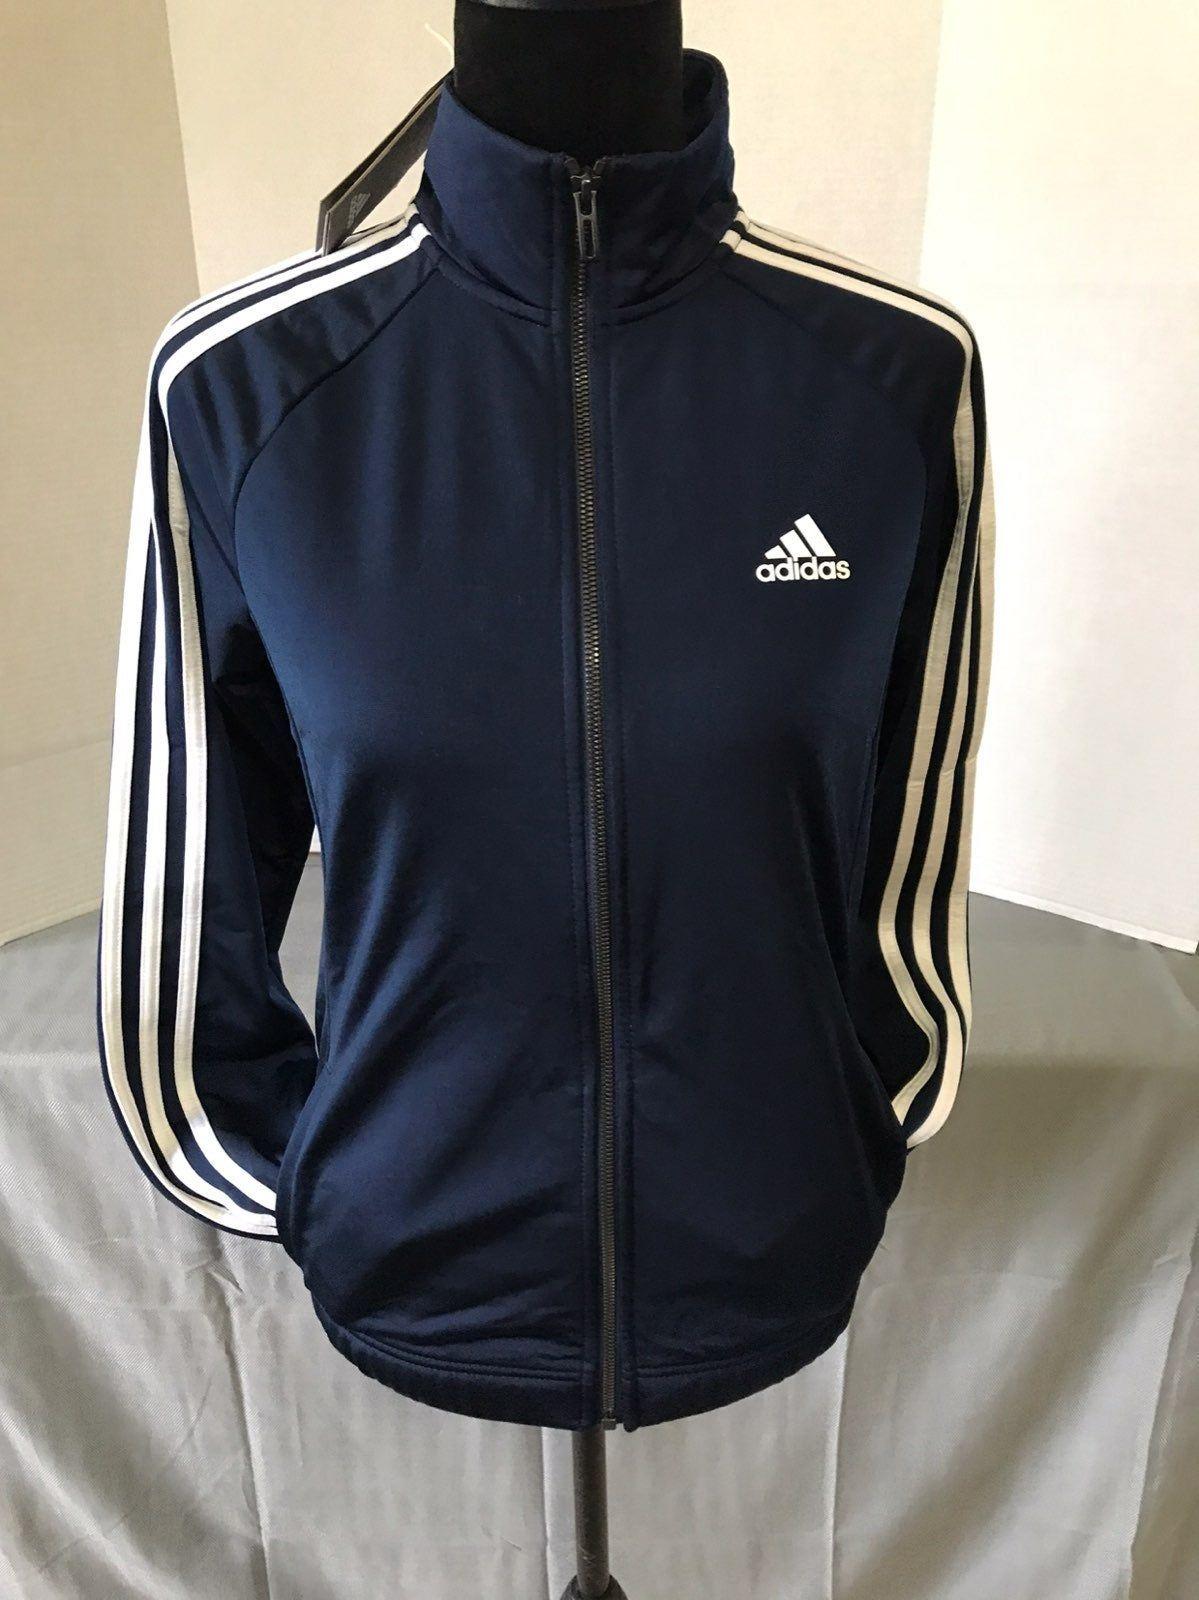 Brand New Adidas 3 Stripes Trackjacket Navy Blue Women Sz Small Adidas Adidas Sweats Black Adidas [ 1600 x 1199 Pixel ]